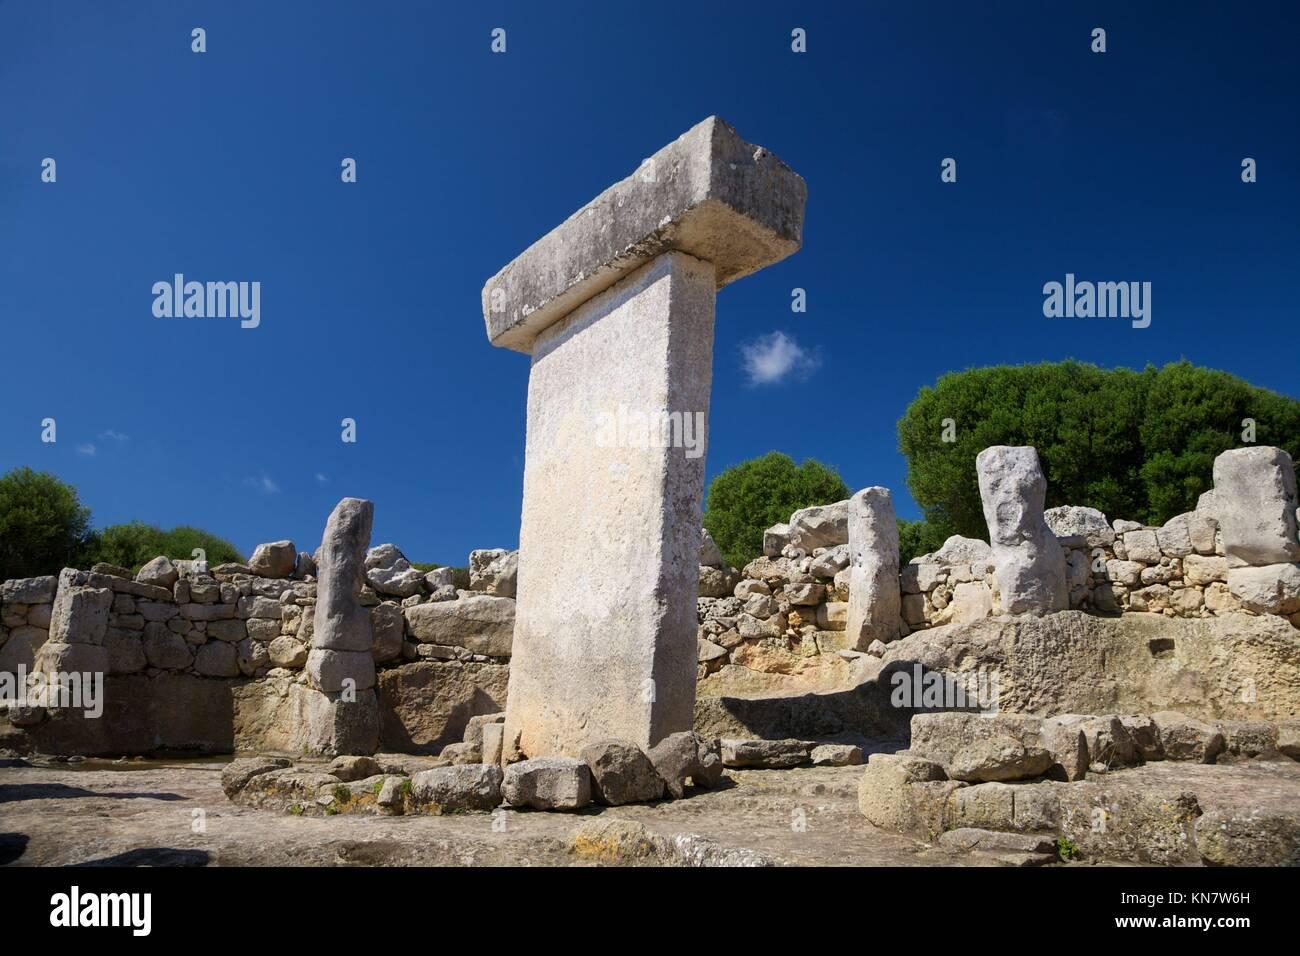 Torralba den Salord prehistoric town at Menorca Island in Spain. - Stock Image